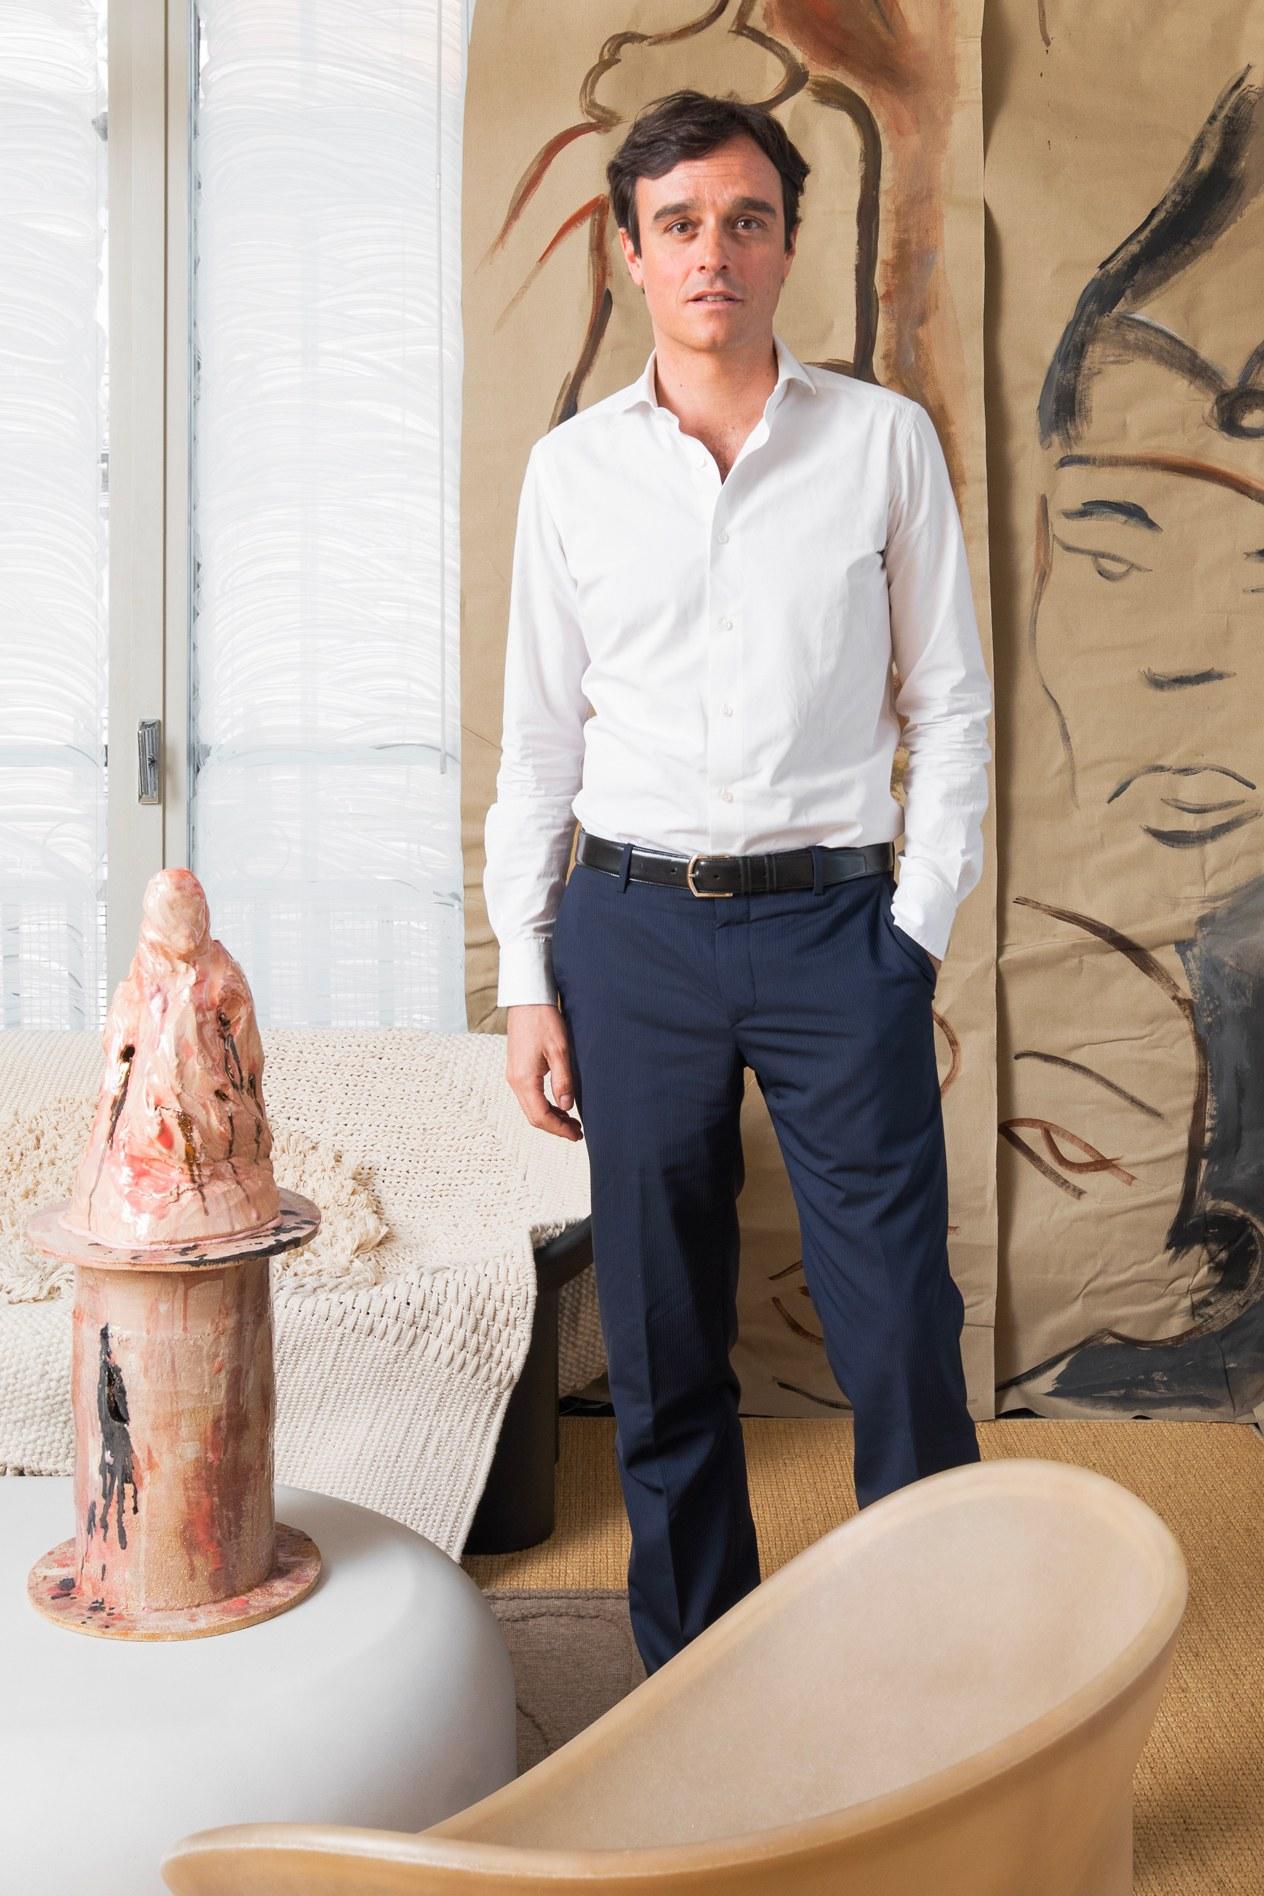 Vogue editor-in-chief Emanuele Farneti for Vogue Italia September 2019 by © DSL Studio.